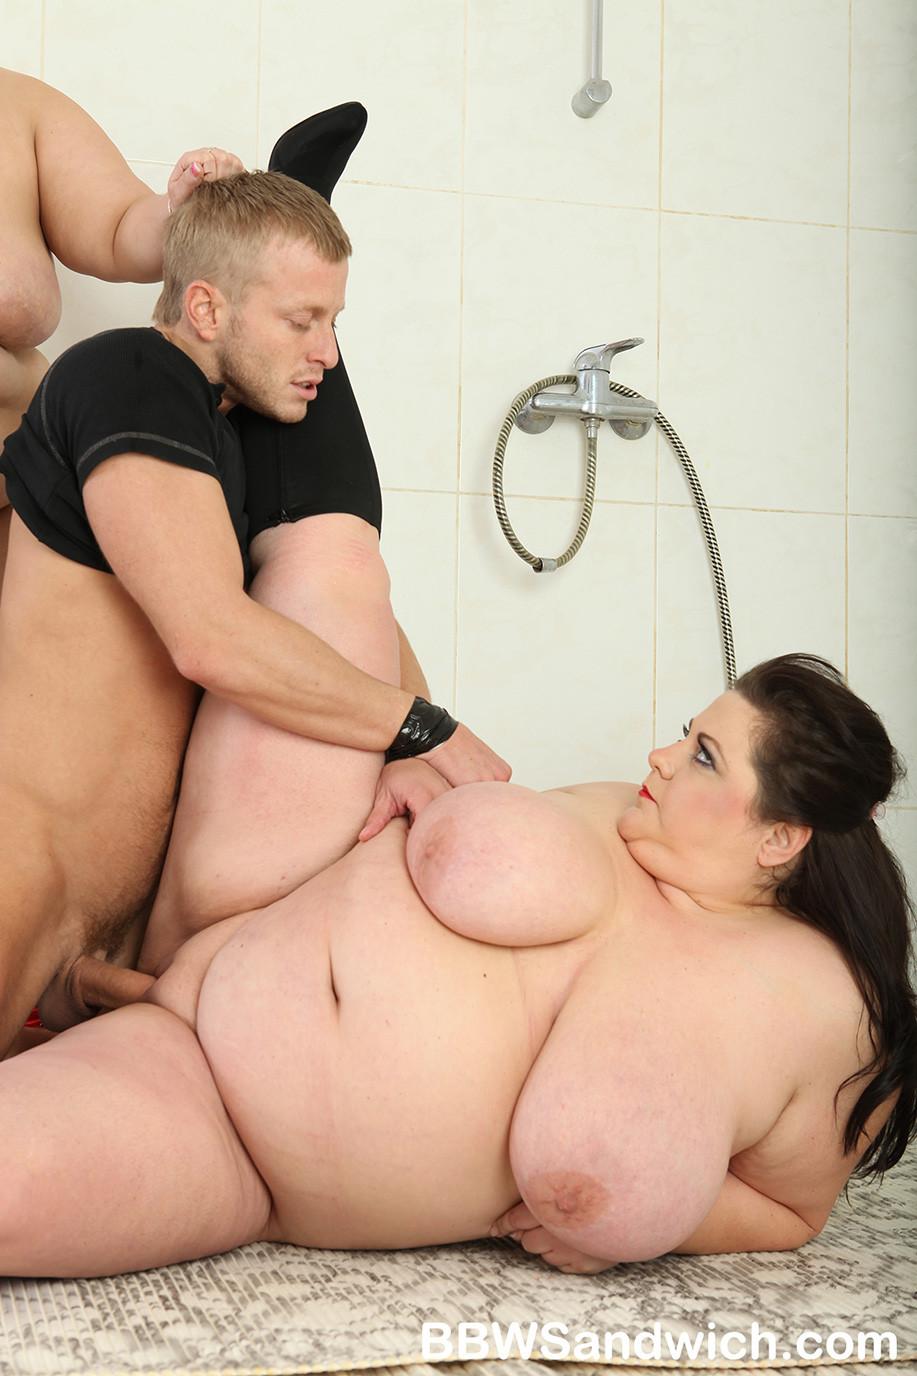 tits Sexy threesome big